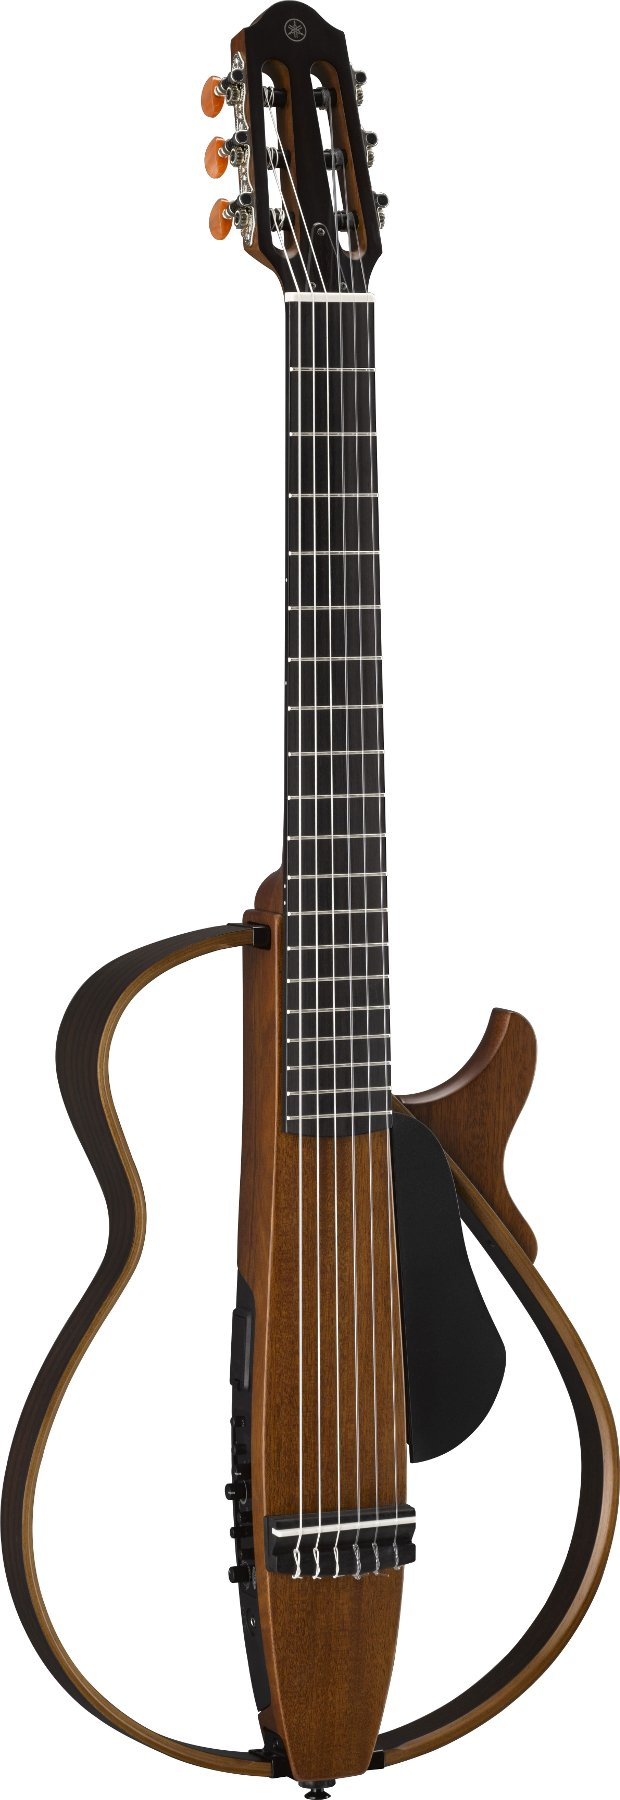 SILENT Nylon-String Guitar, Natural Finish